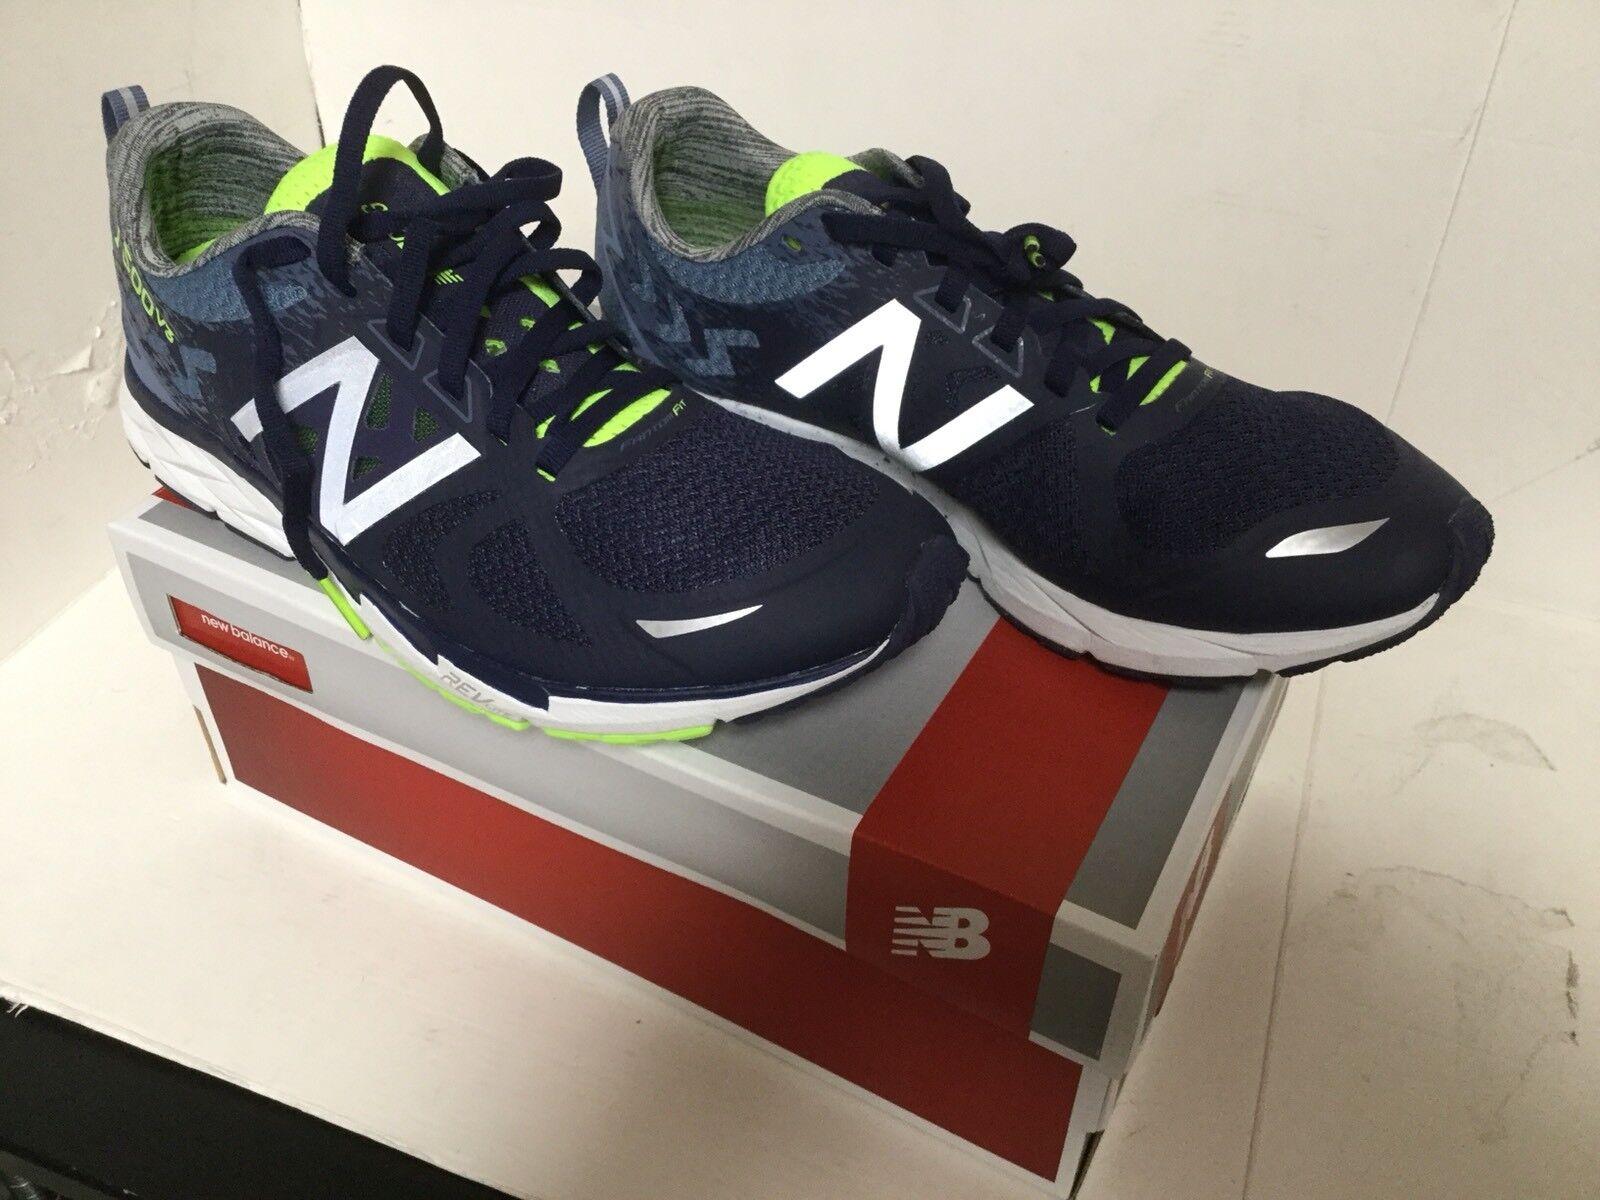 NEW NEW BALANCE 1500 v3 / Running Shoes - 8D/M(US) / v3 41.5(UK) - Blue - Free Ship! 717ca0